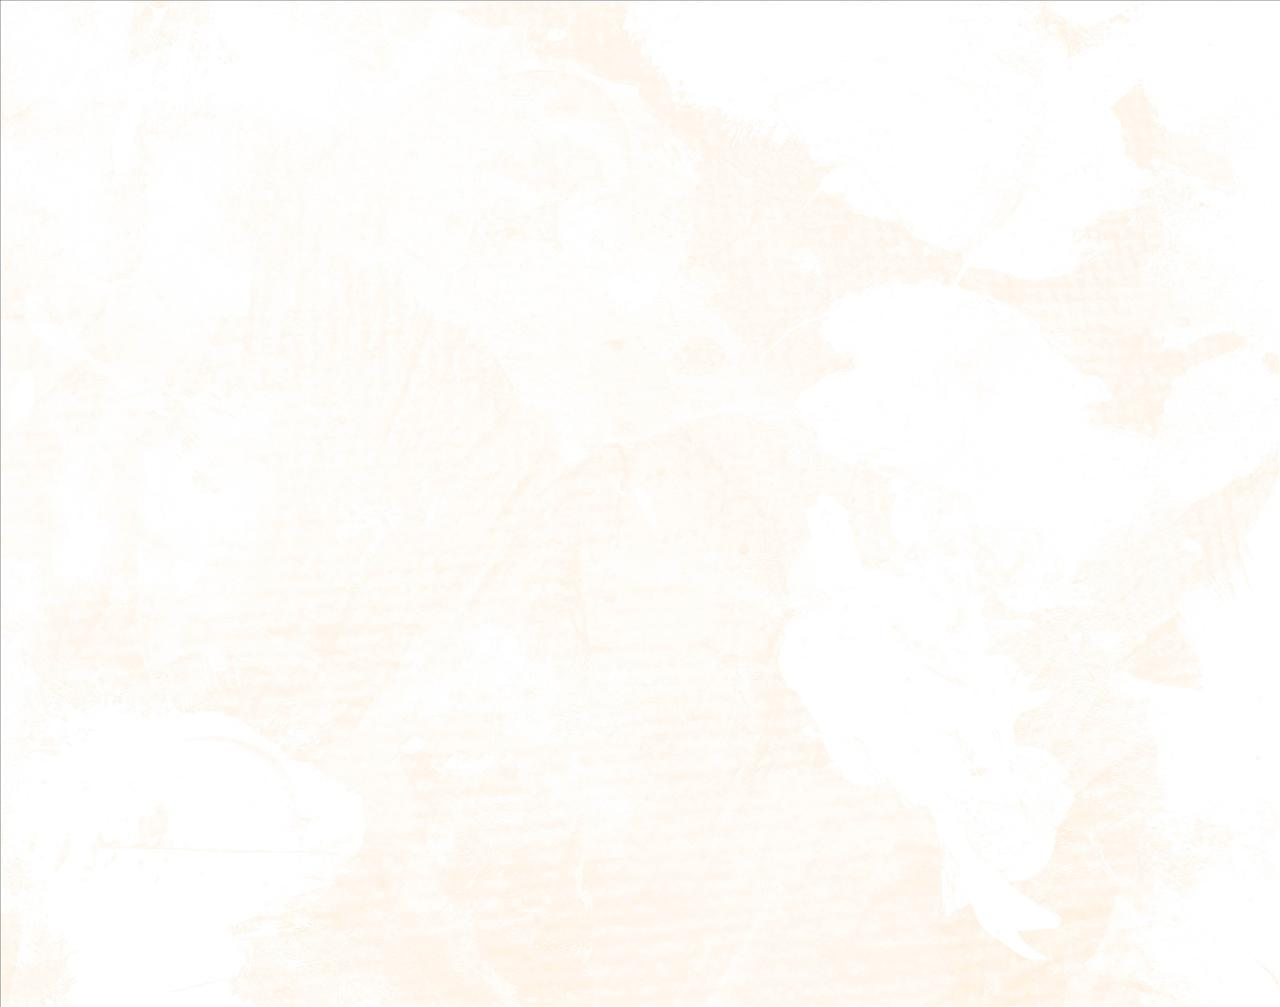 71 White Screen Wallpaper On Wallpapersafari